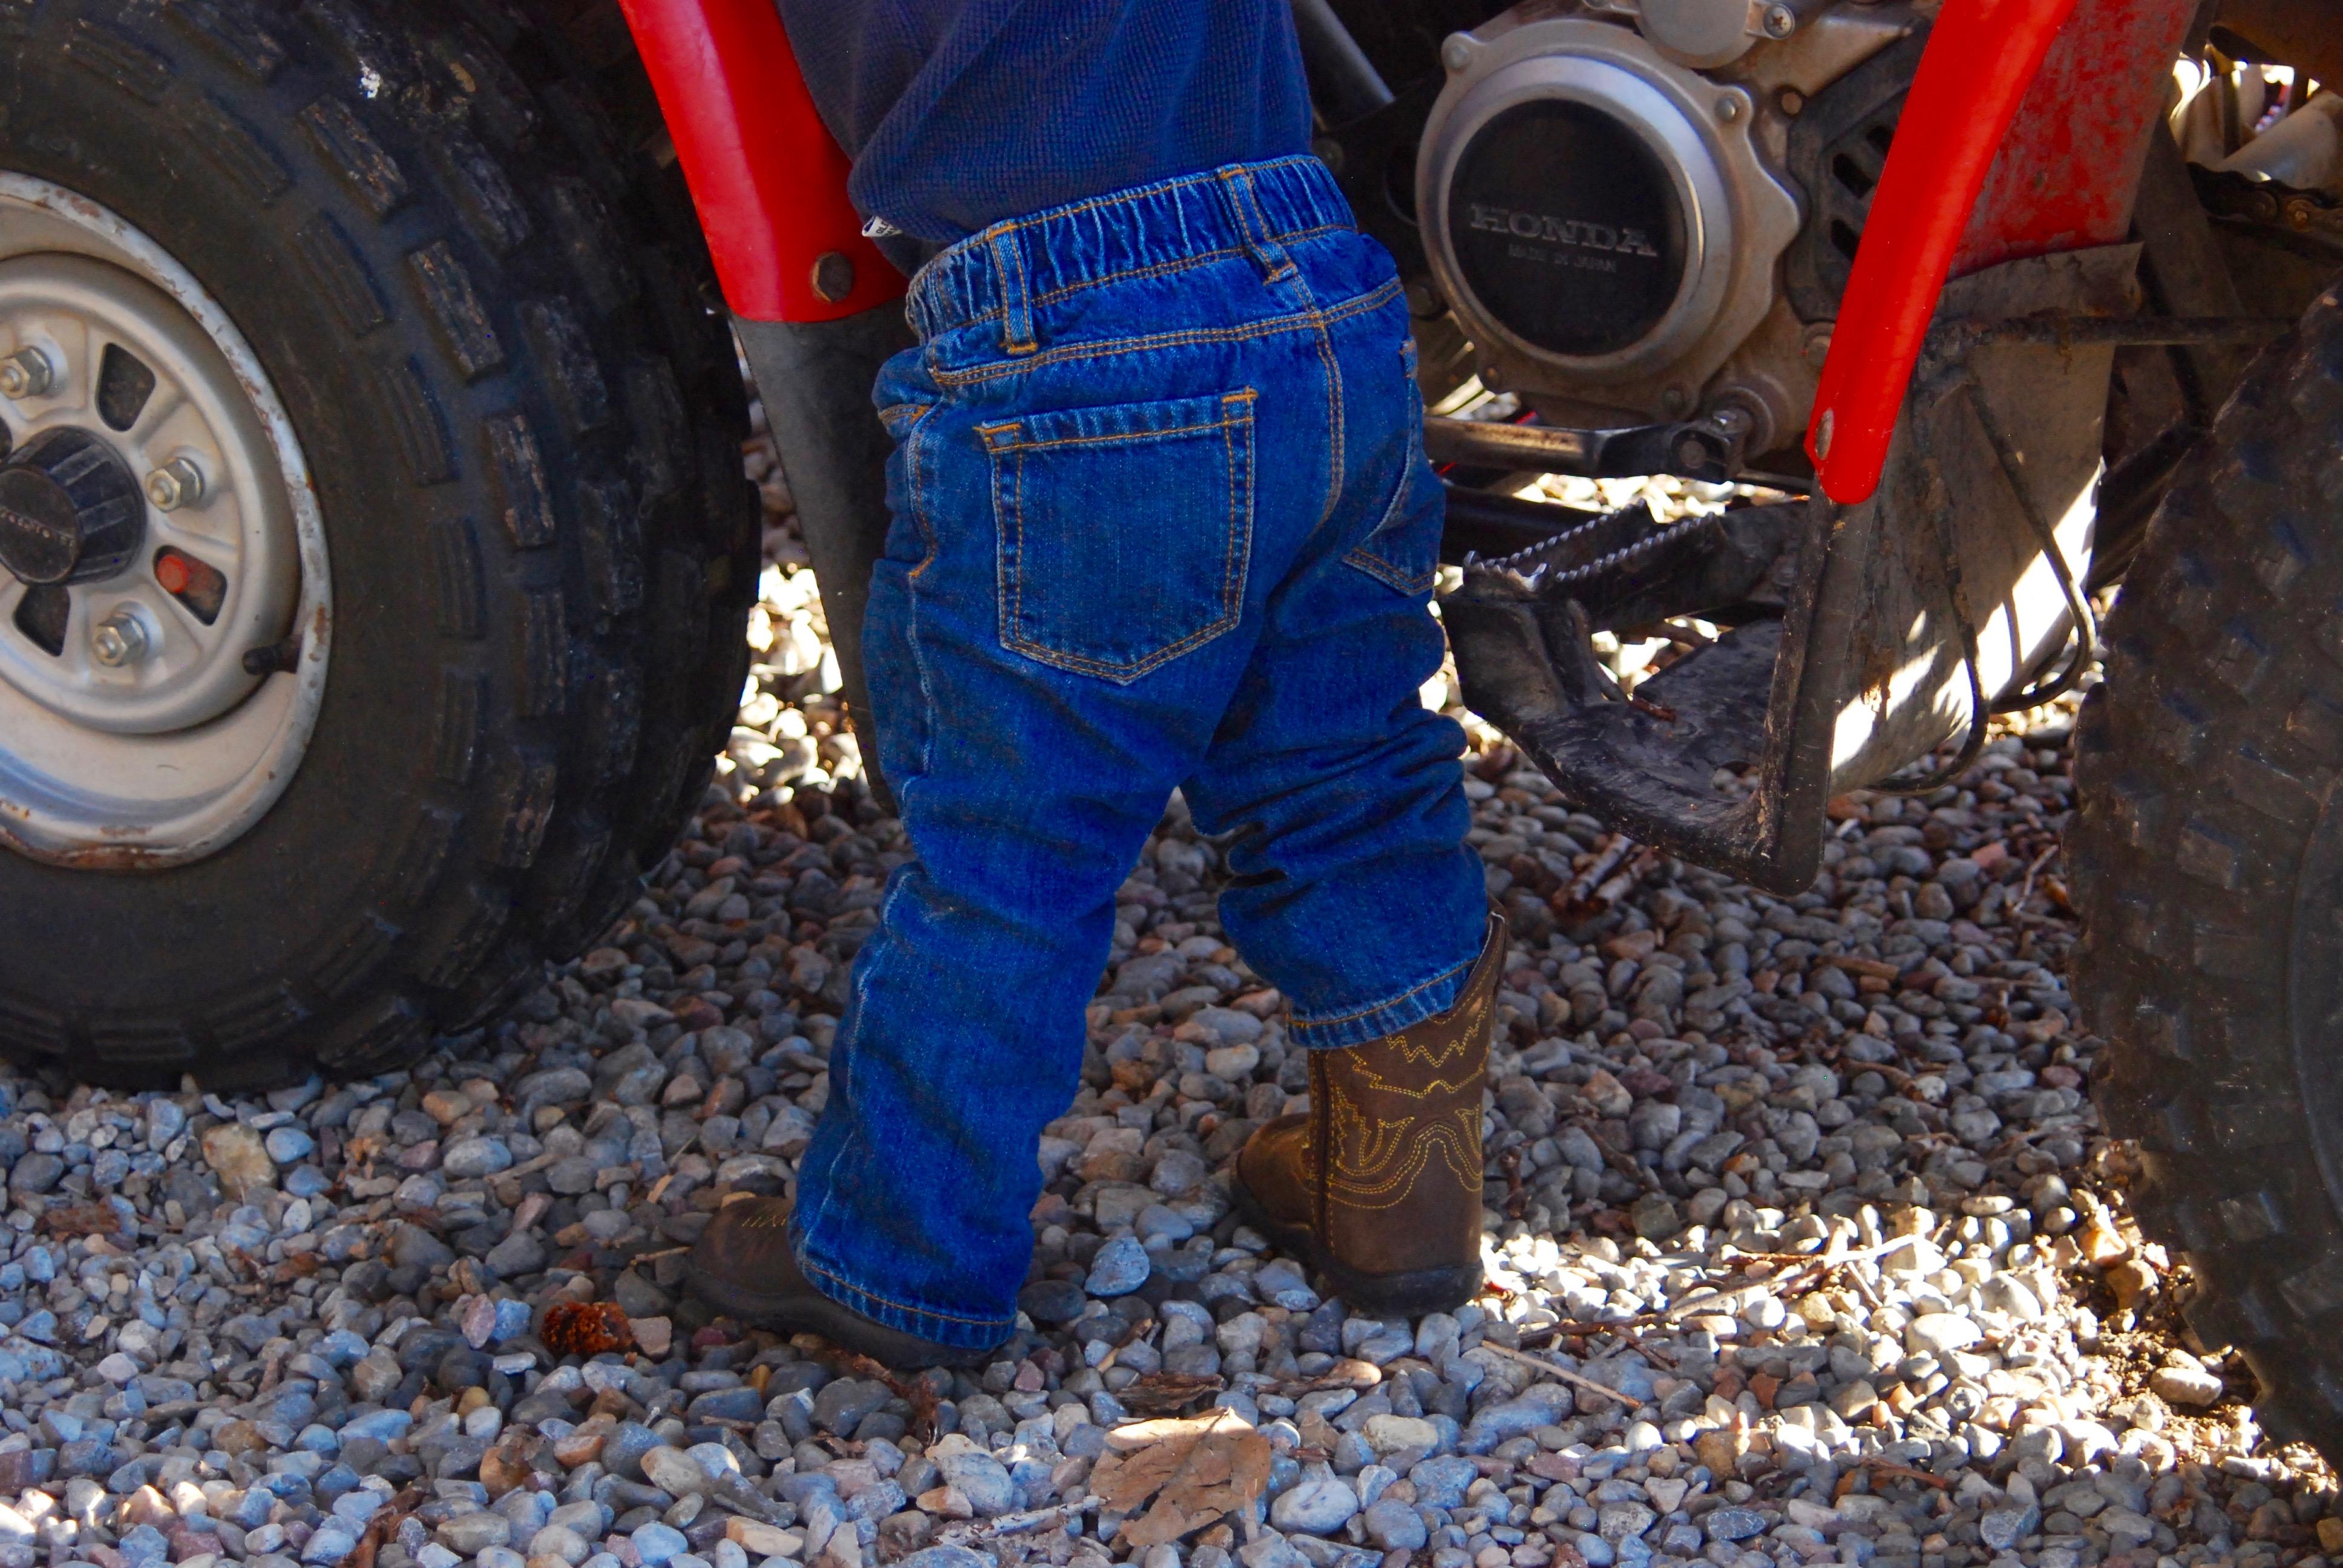 Tiny boots back